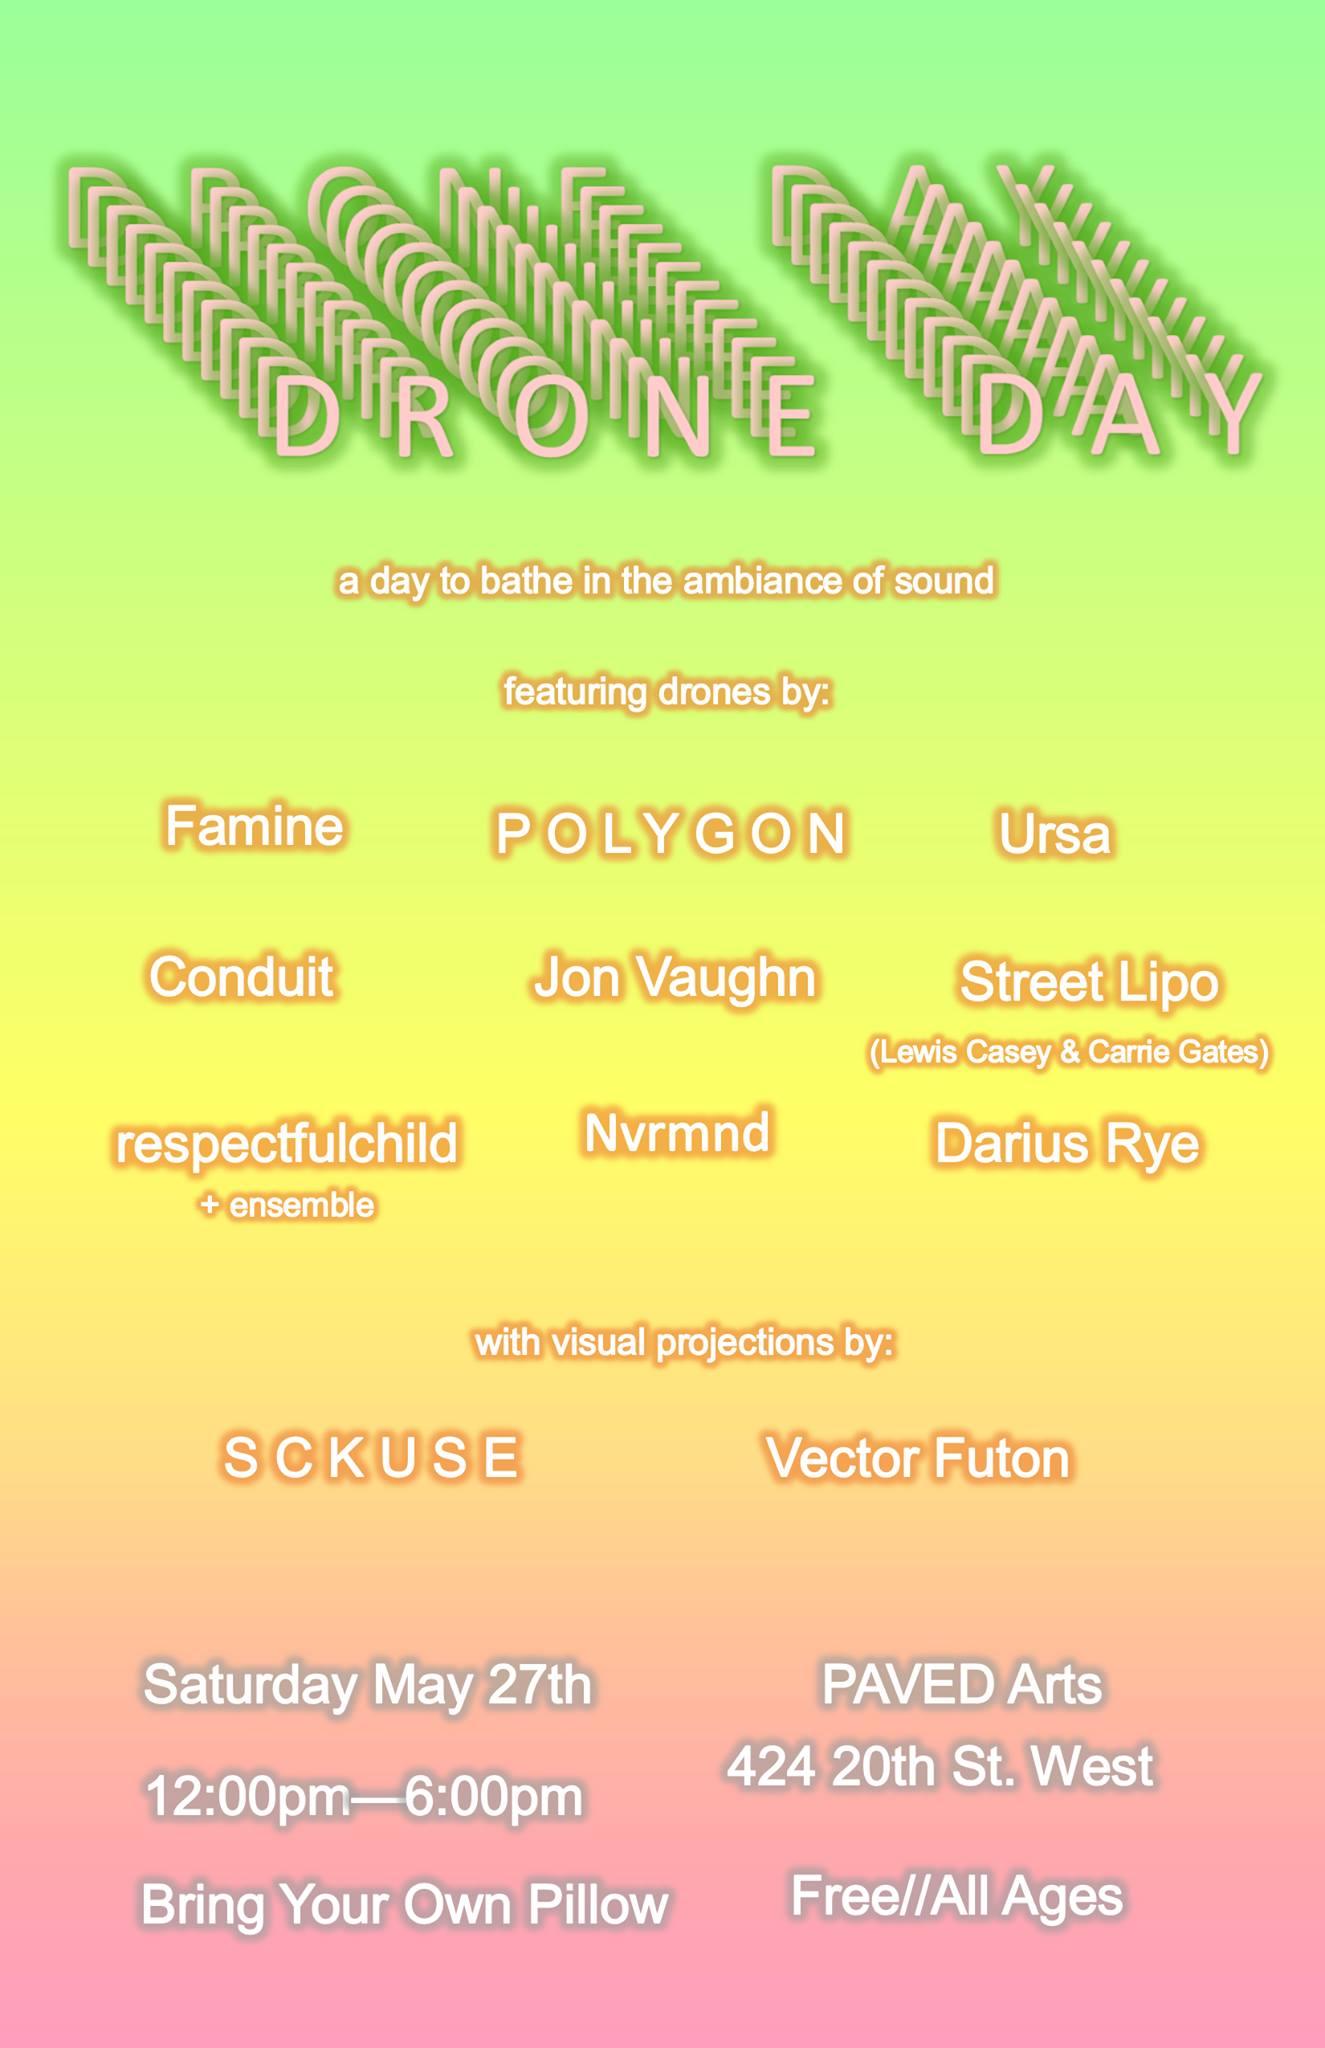 Drone Day at Paved Arts - May 27 2017